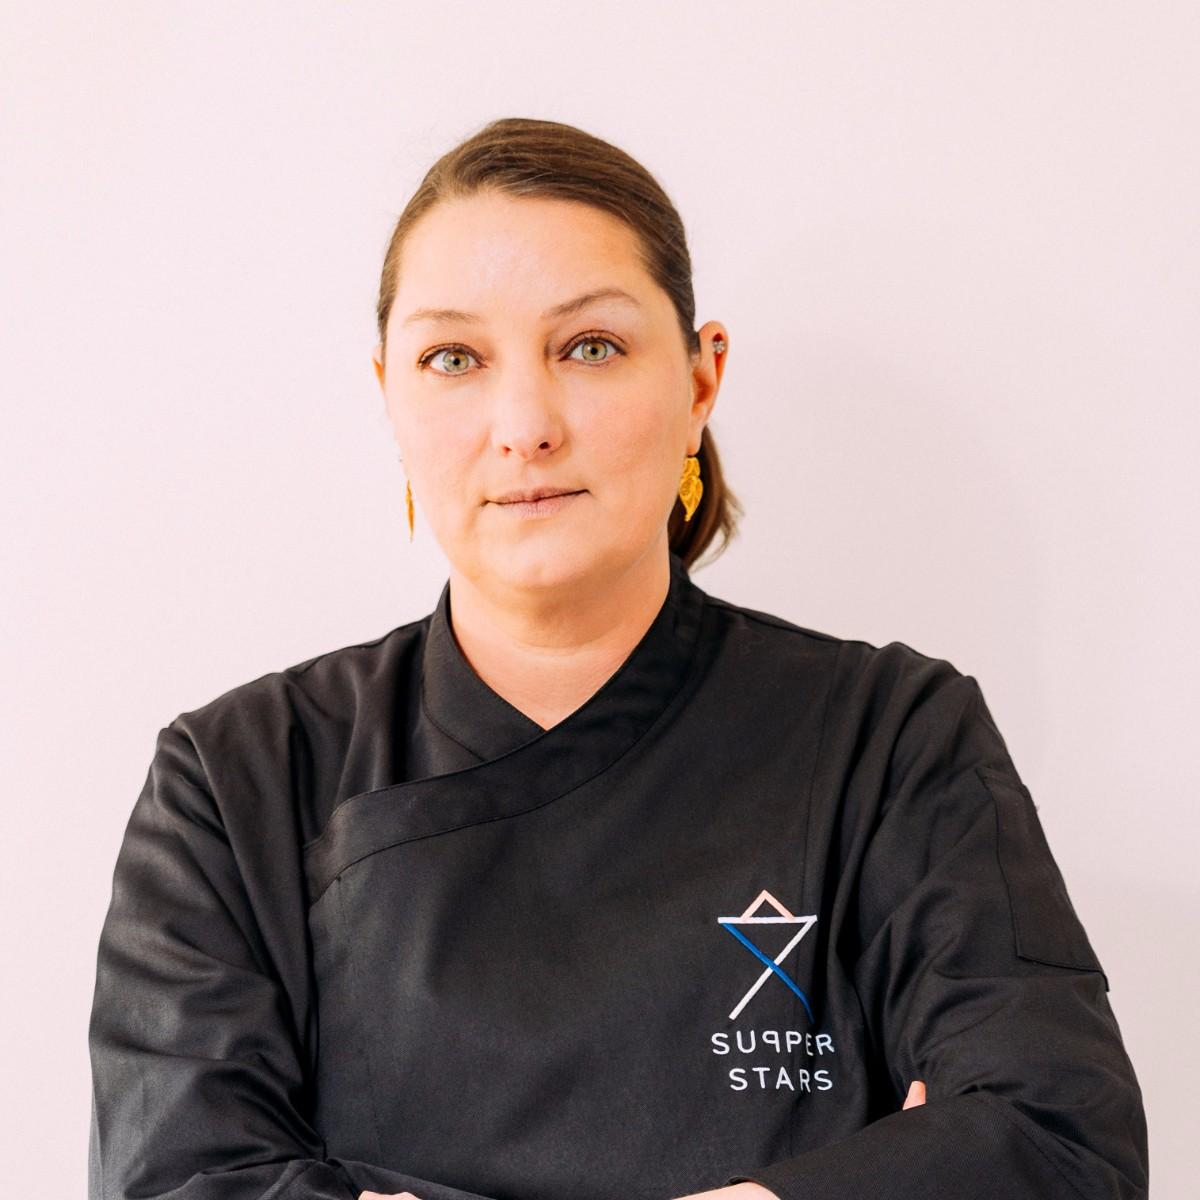 Silvia Brandi